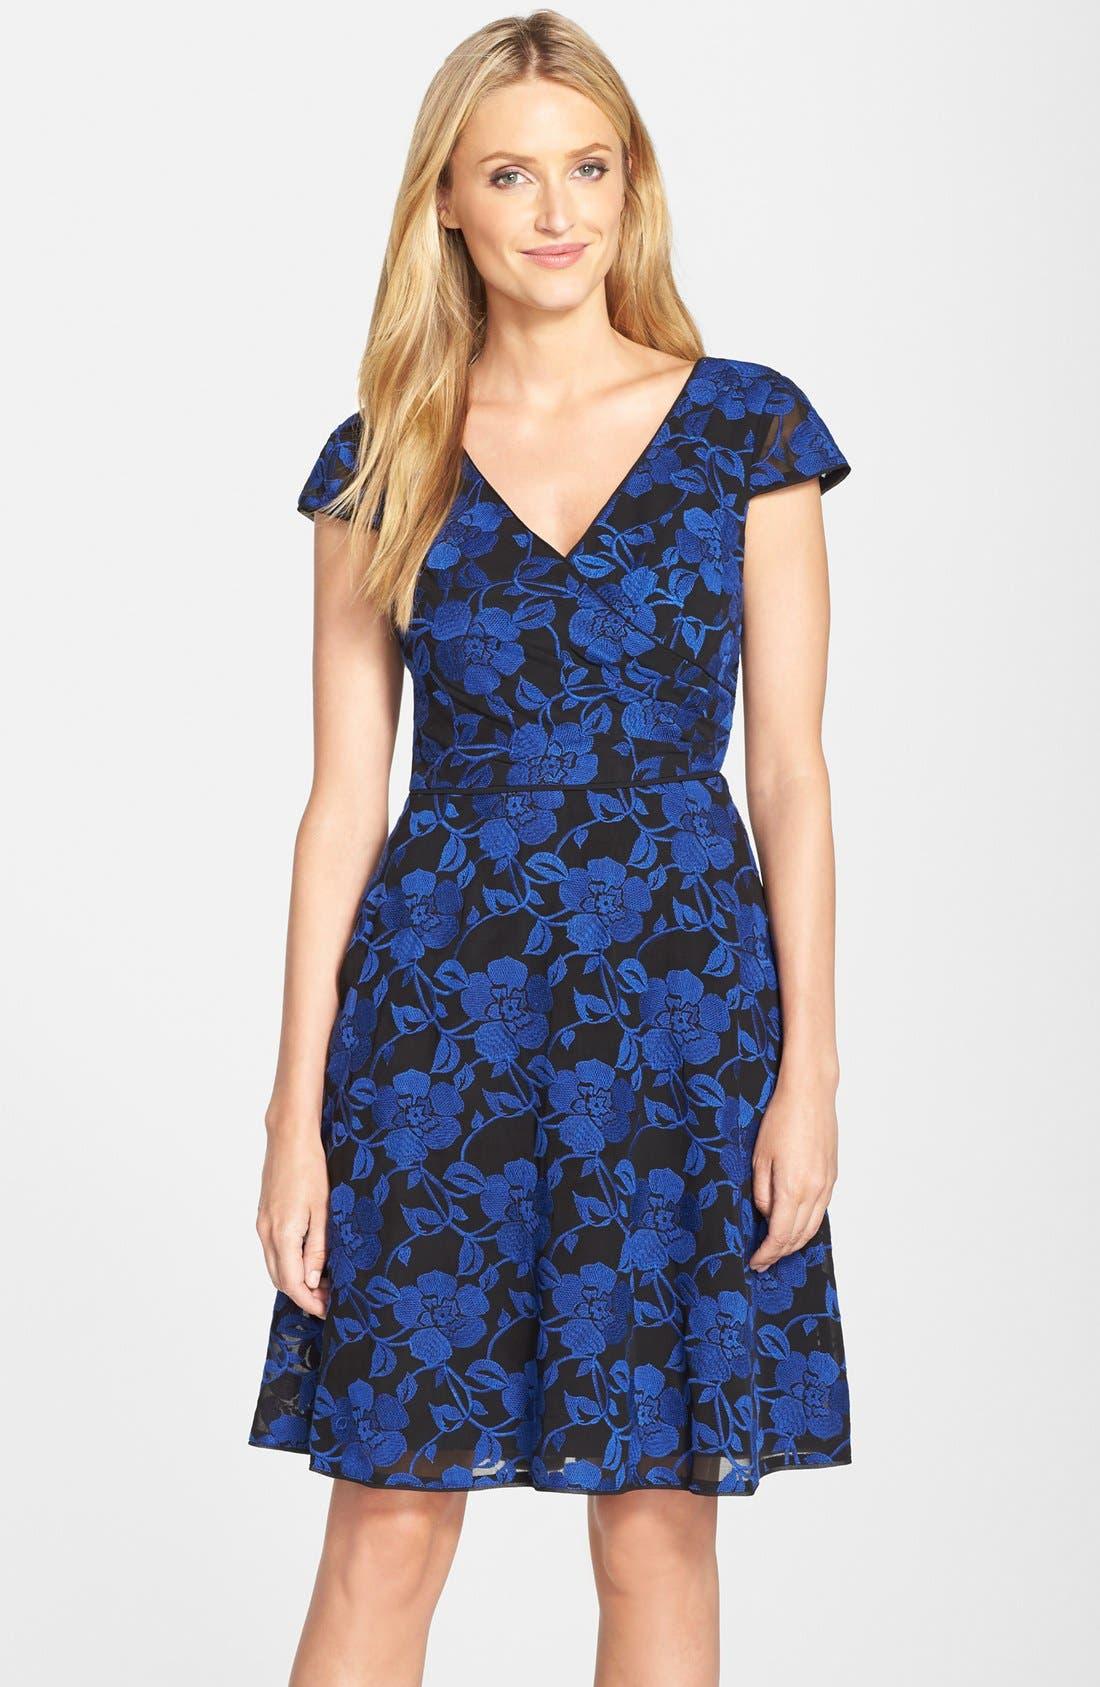 Main Image - Adrianna Papell Print Chiffon Fit & Flare Dress